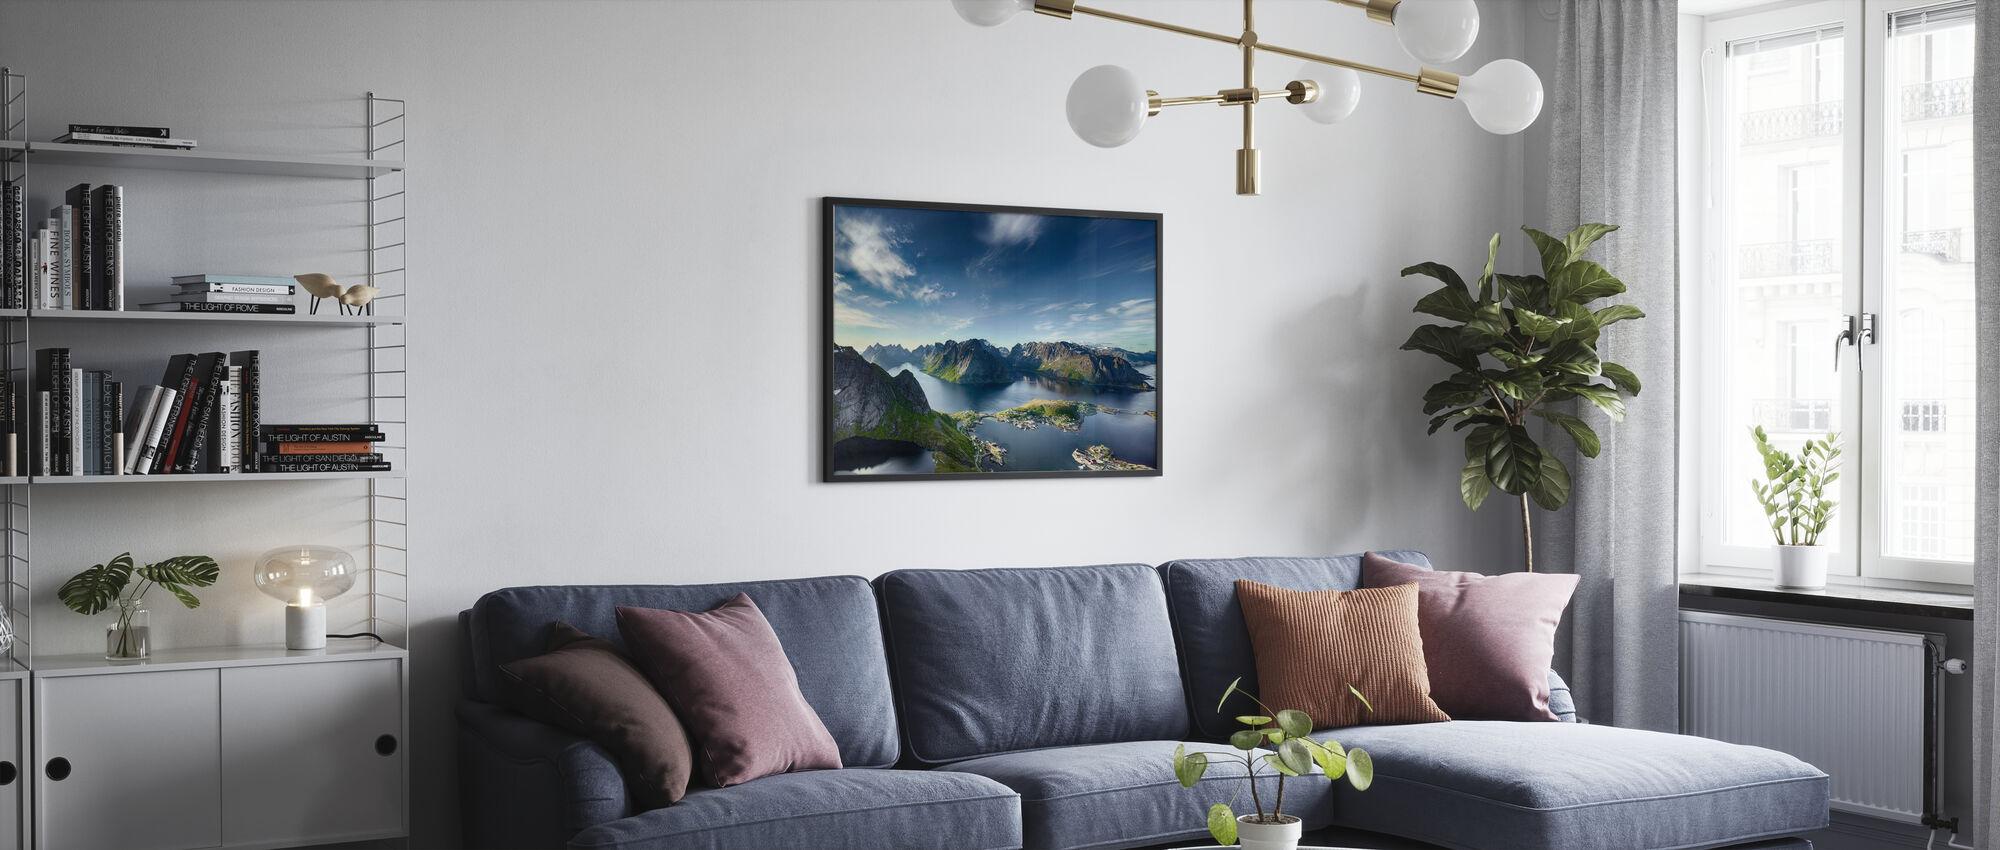 Panoramautsikt över Reine i Lofoten, Norge - Inramad tavla - Vardagsrum